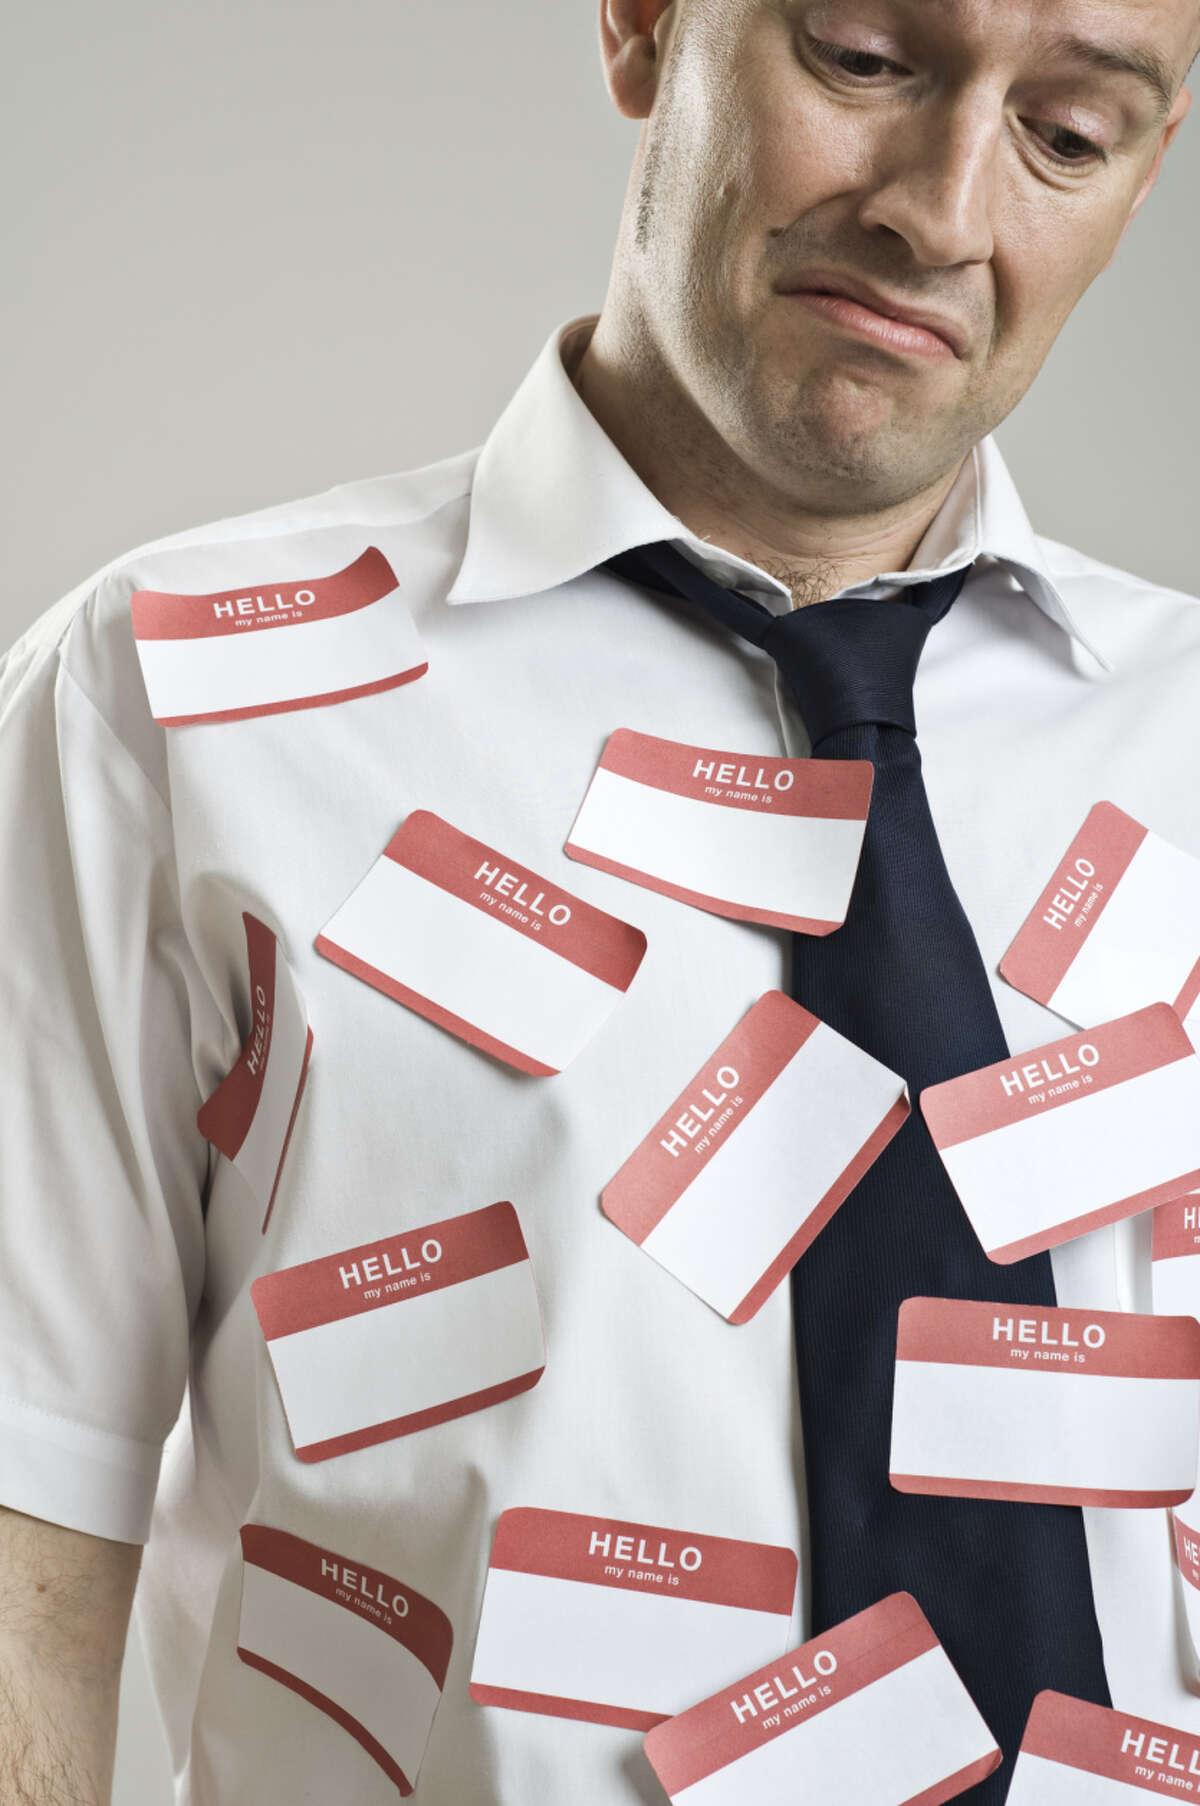 20 worst entry-level jobs 18. New Accounts Representative.